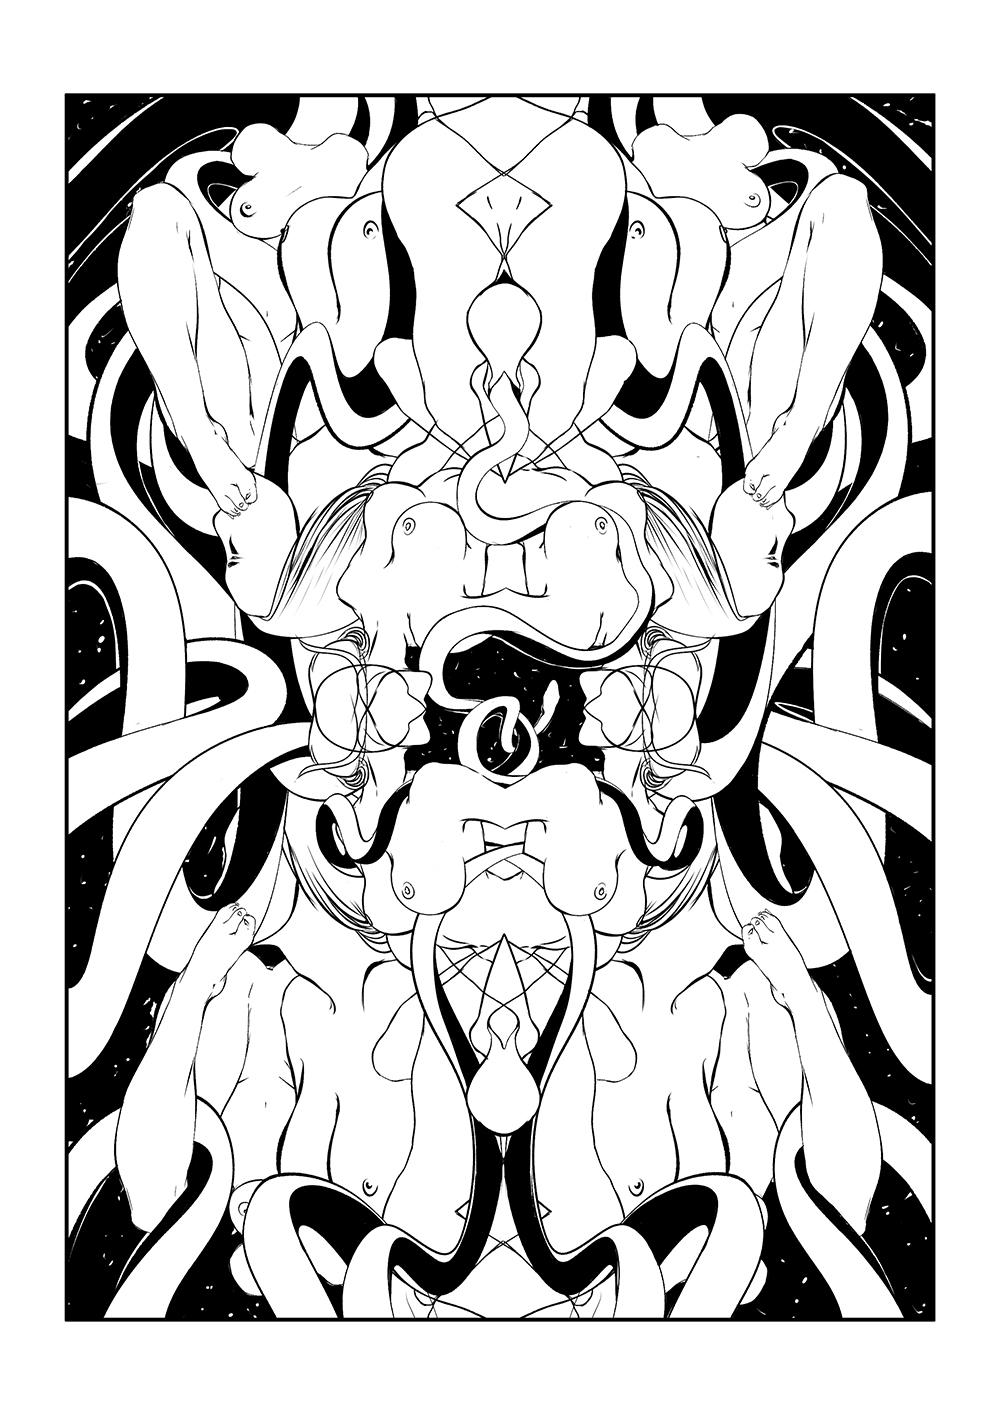 mojowang_illustration_betweenrivers_27_7.jpg